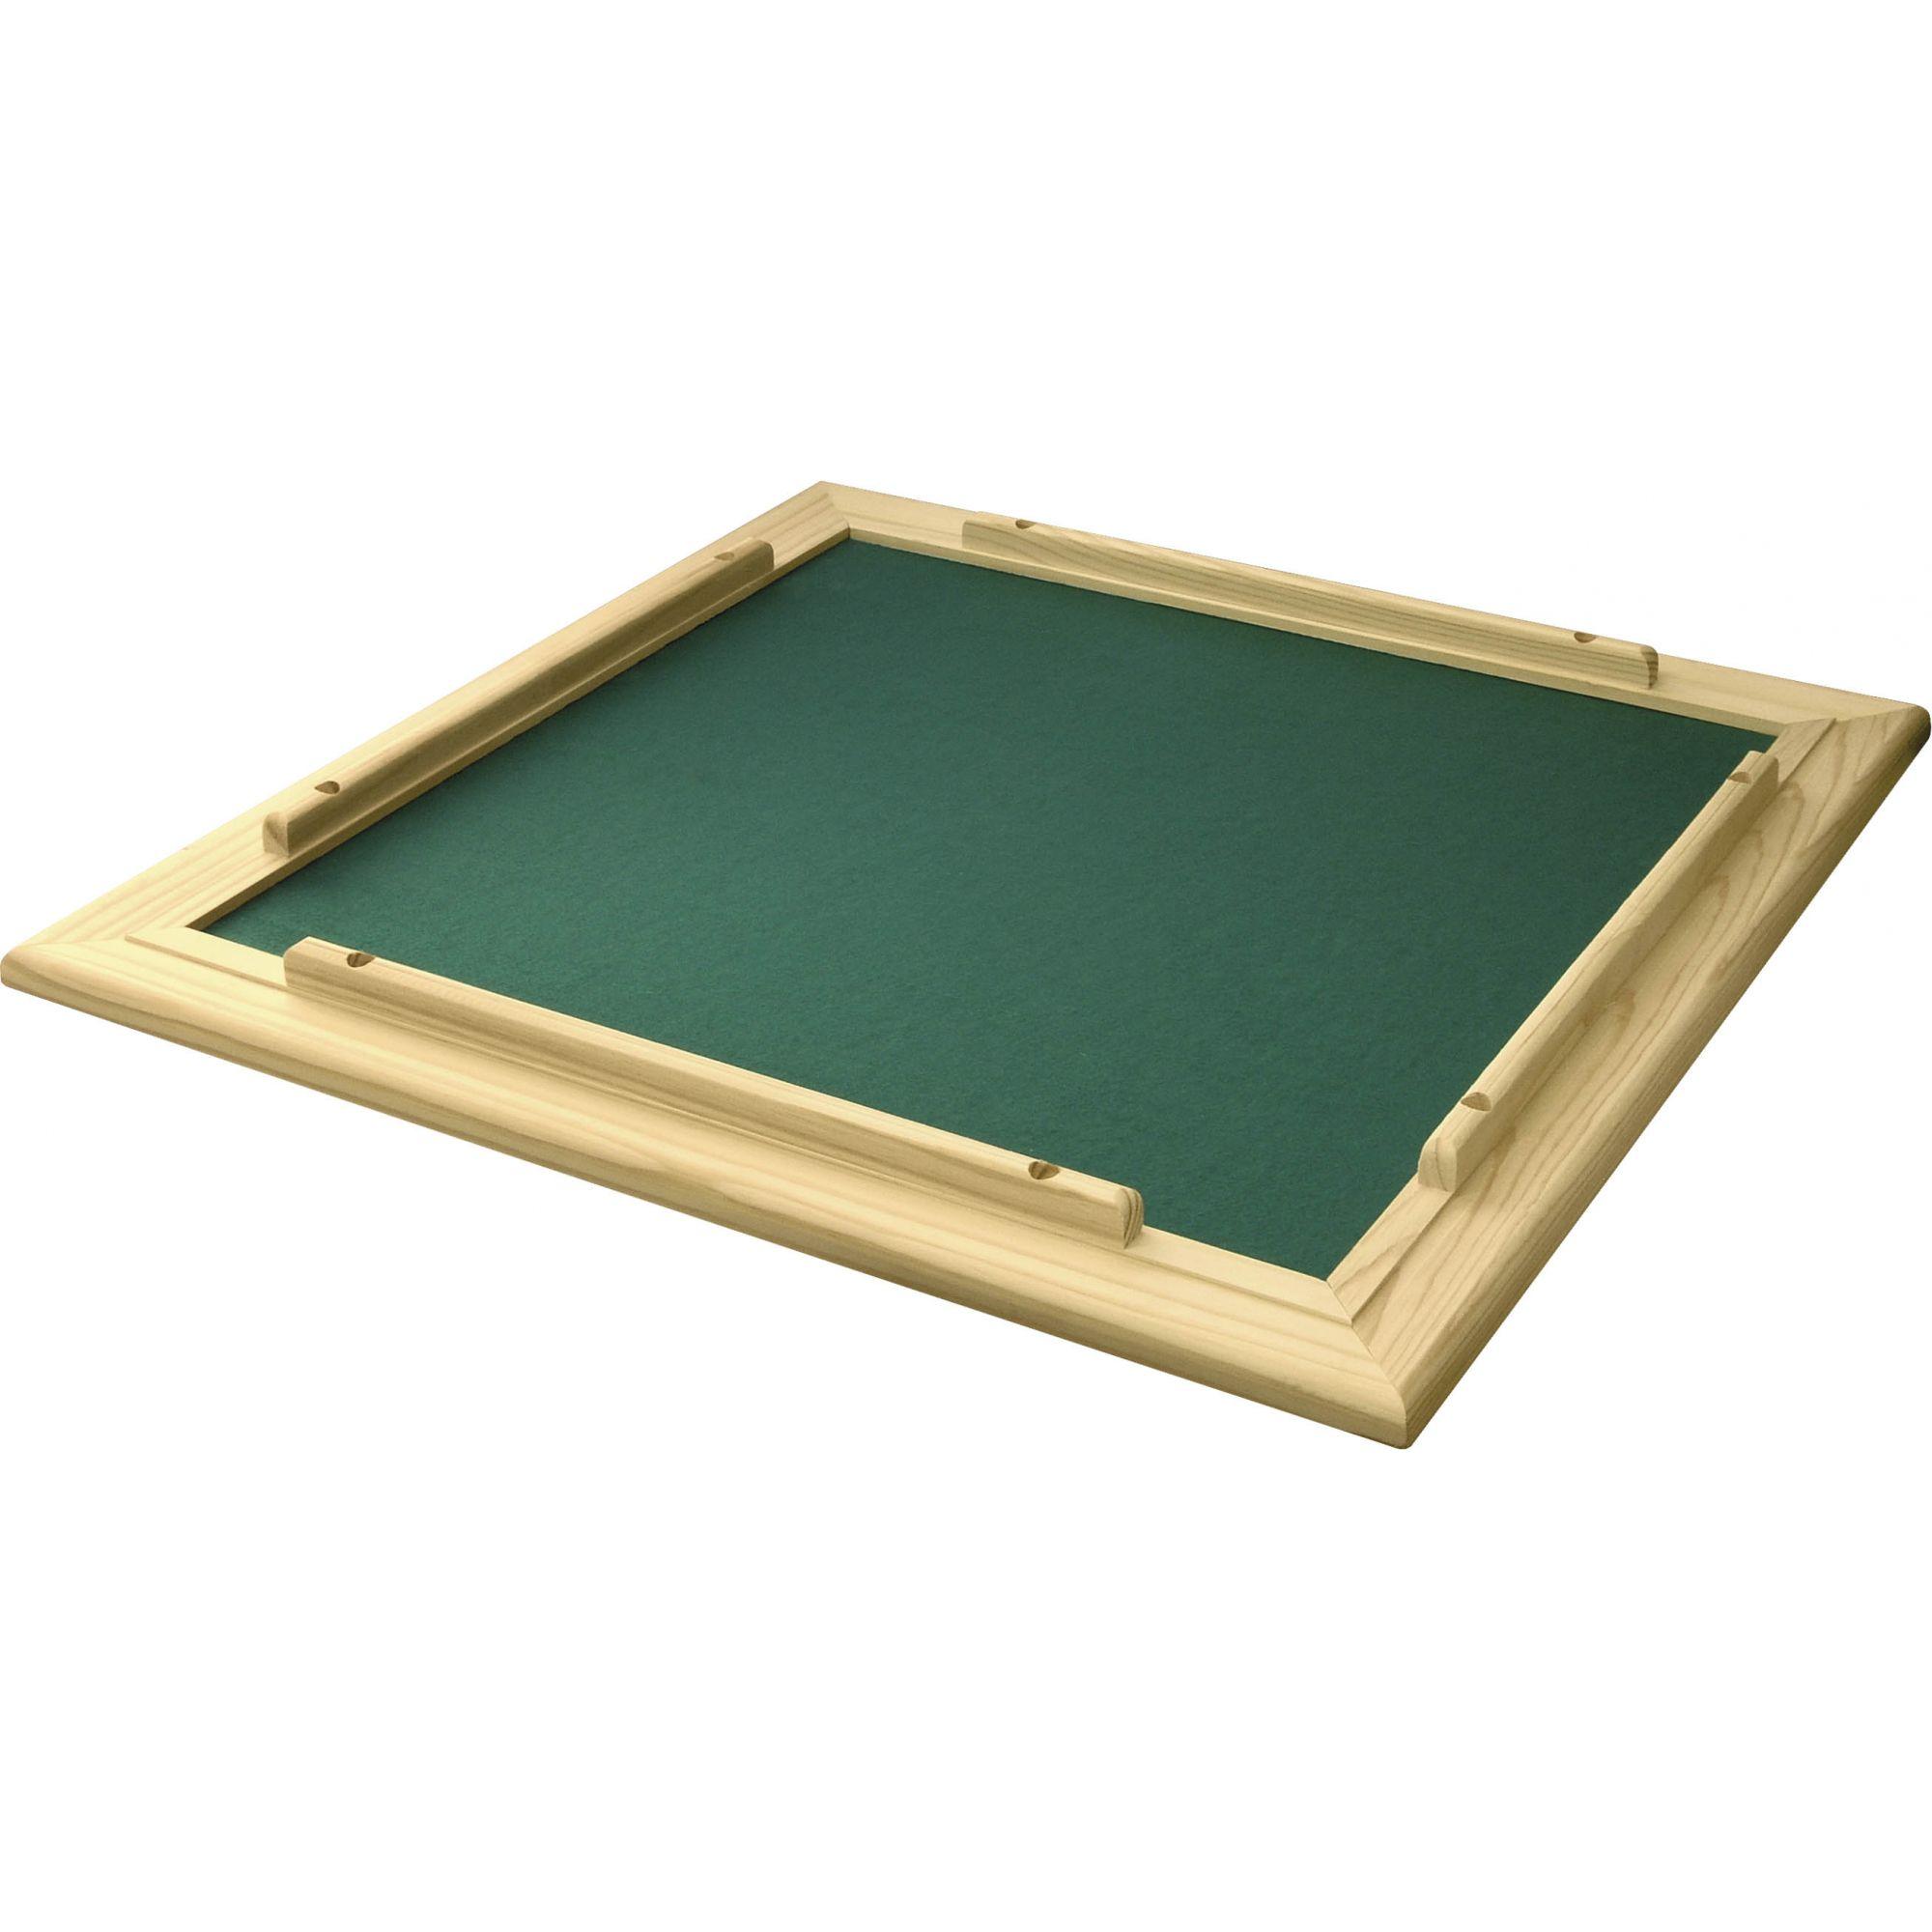 CONJ 3 Tabuleiros de Mesa Para DOMINÓ Com Feltro Verde 66x66 cm 7009